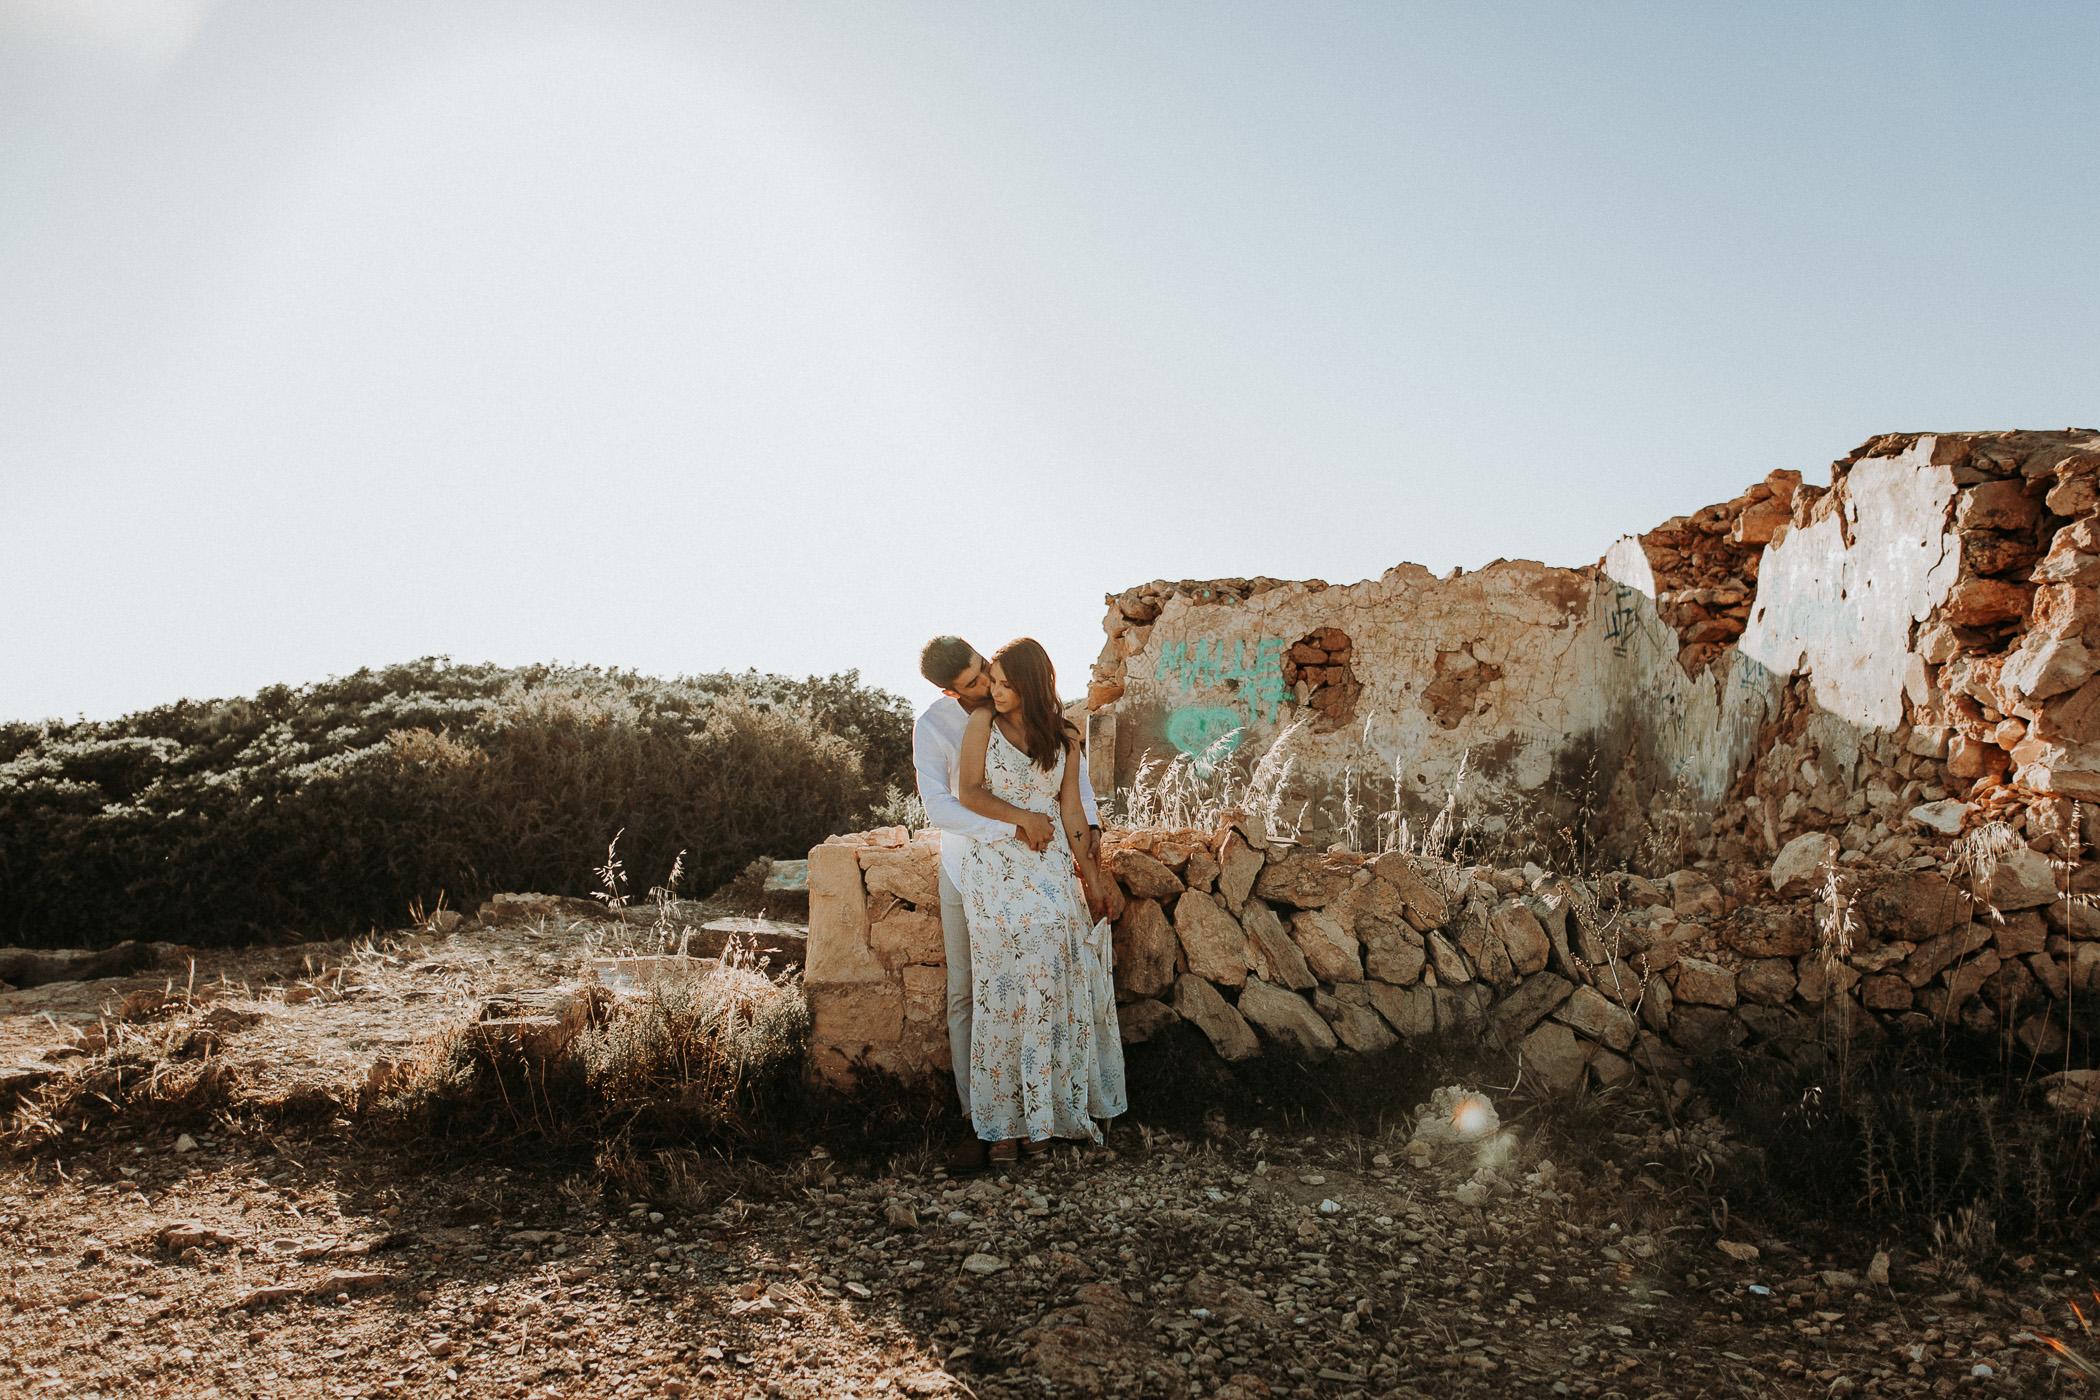 DanielaMarquardtPhotography_wedding_elopement_mallorca_spain_calapi_palma_lauraandtoni_372